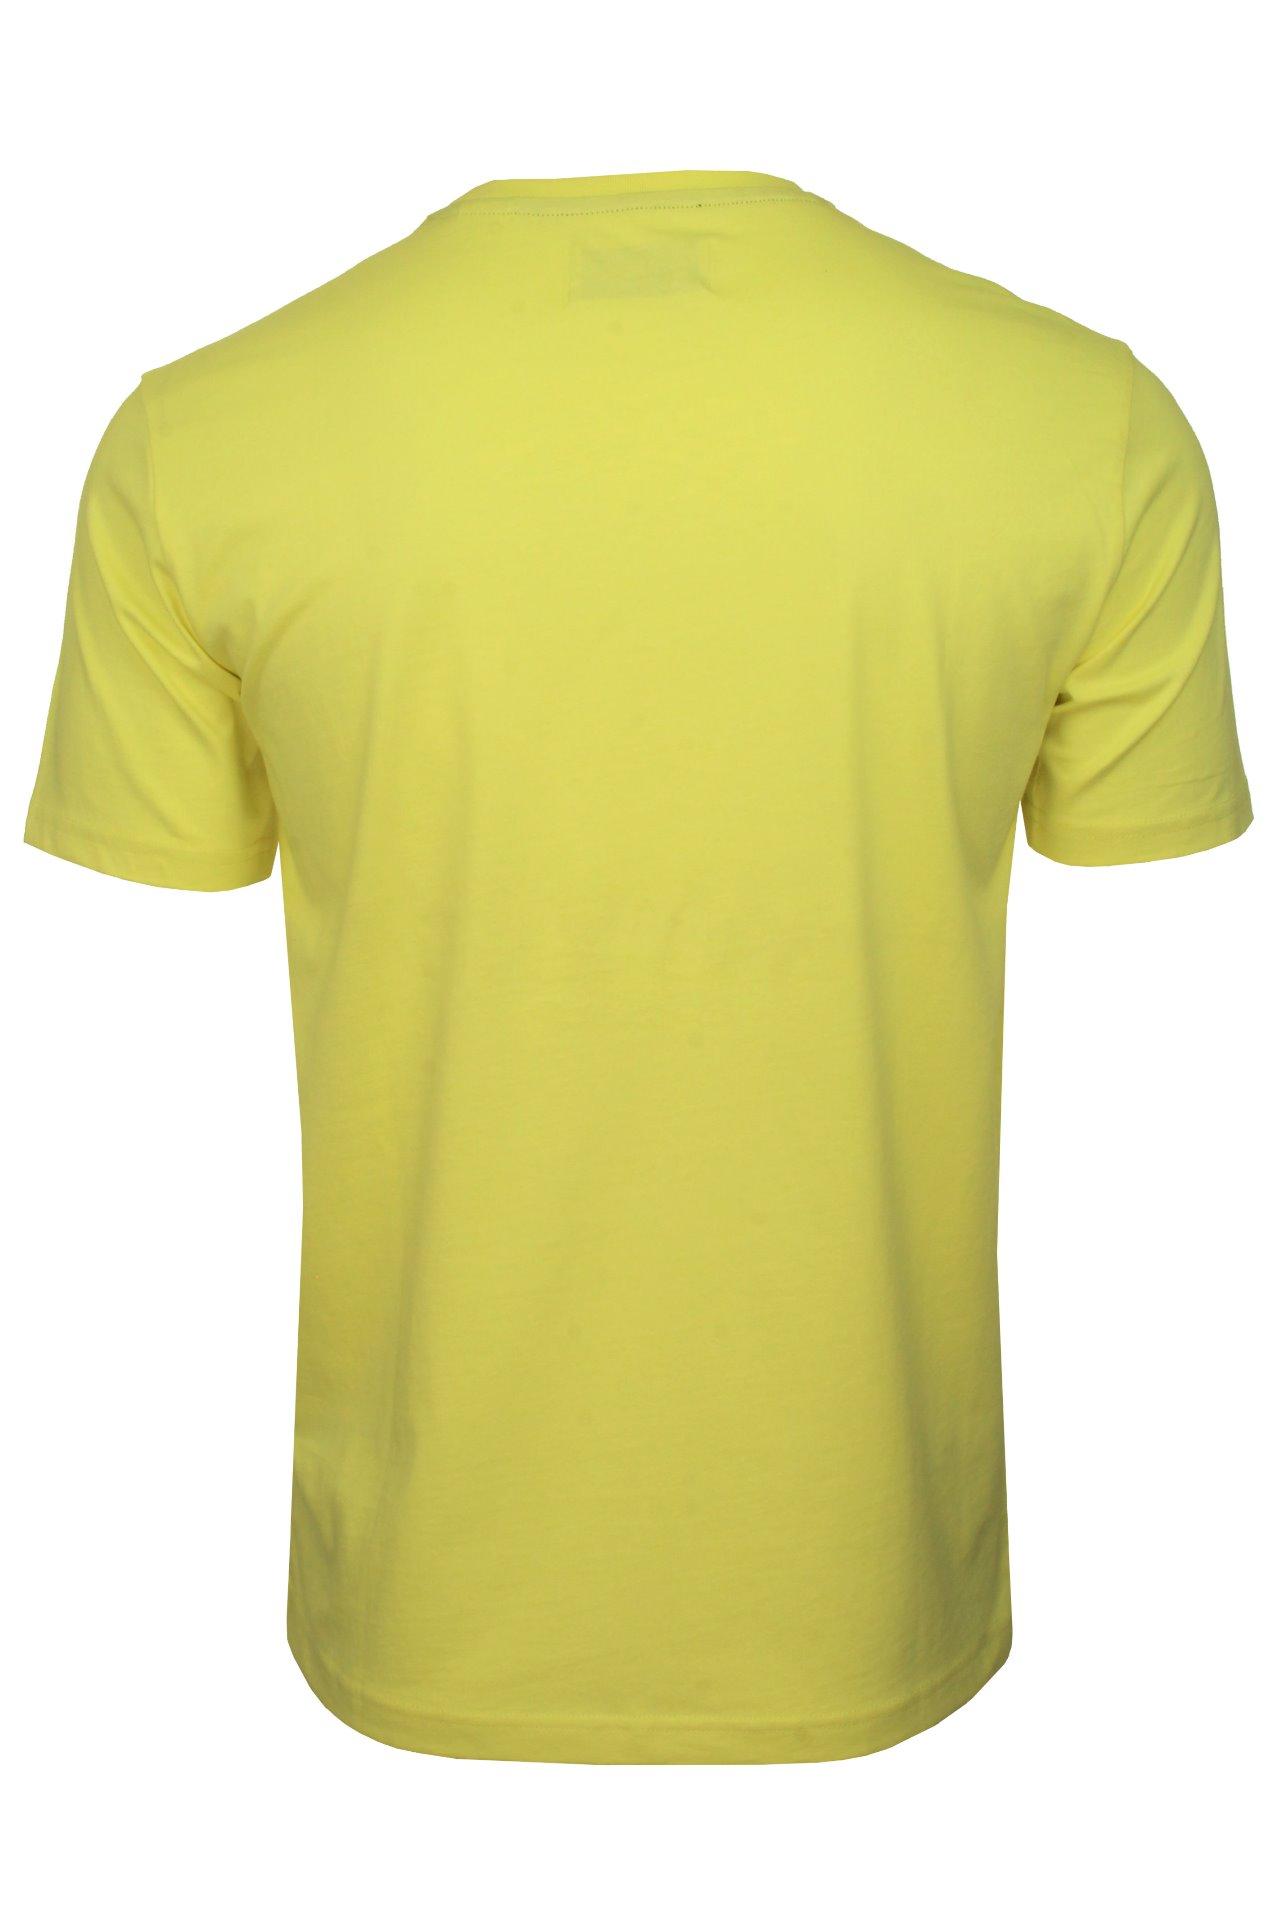 Original-Penguin-Hombre-Camiseta-de-manga-corta miniatura 44